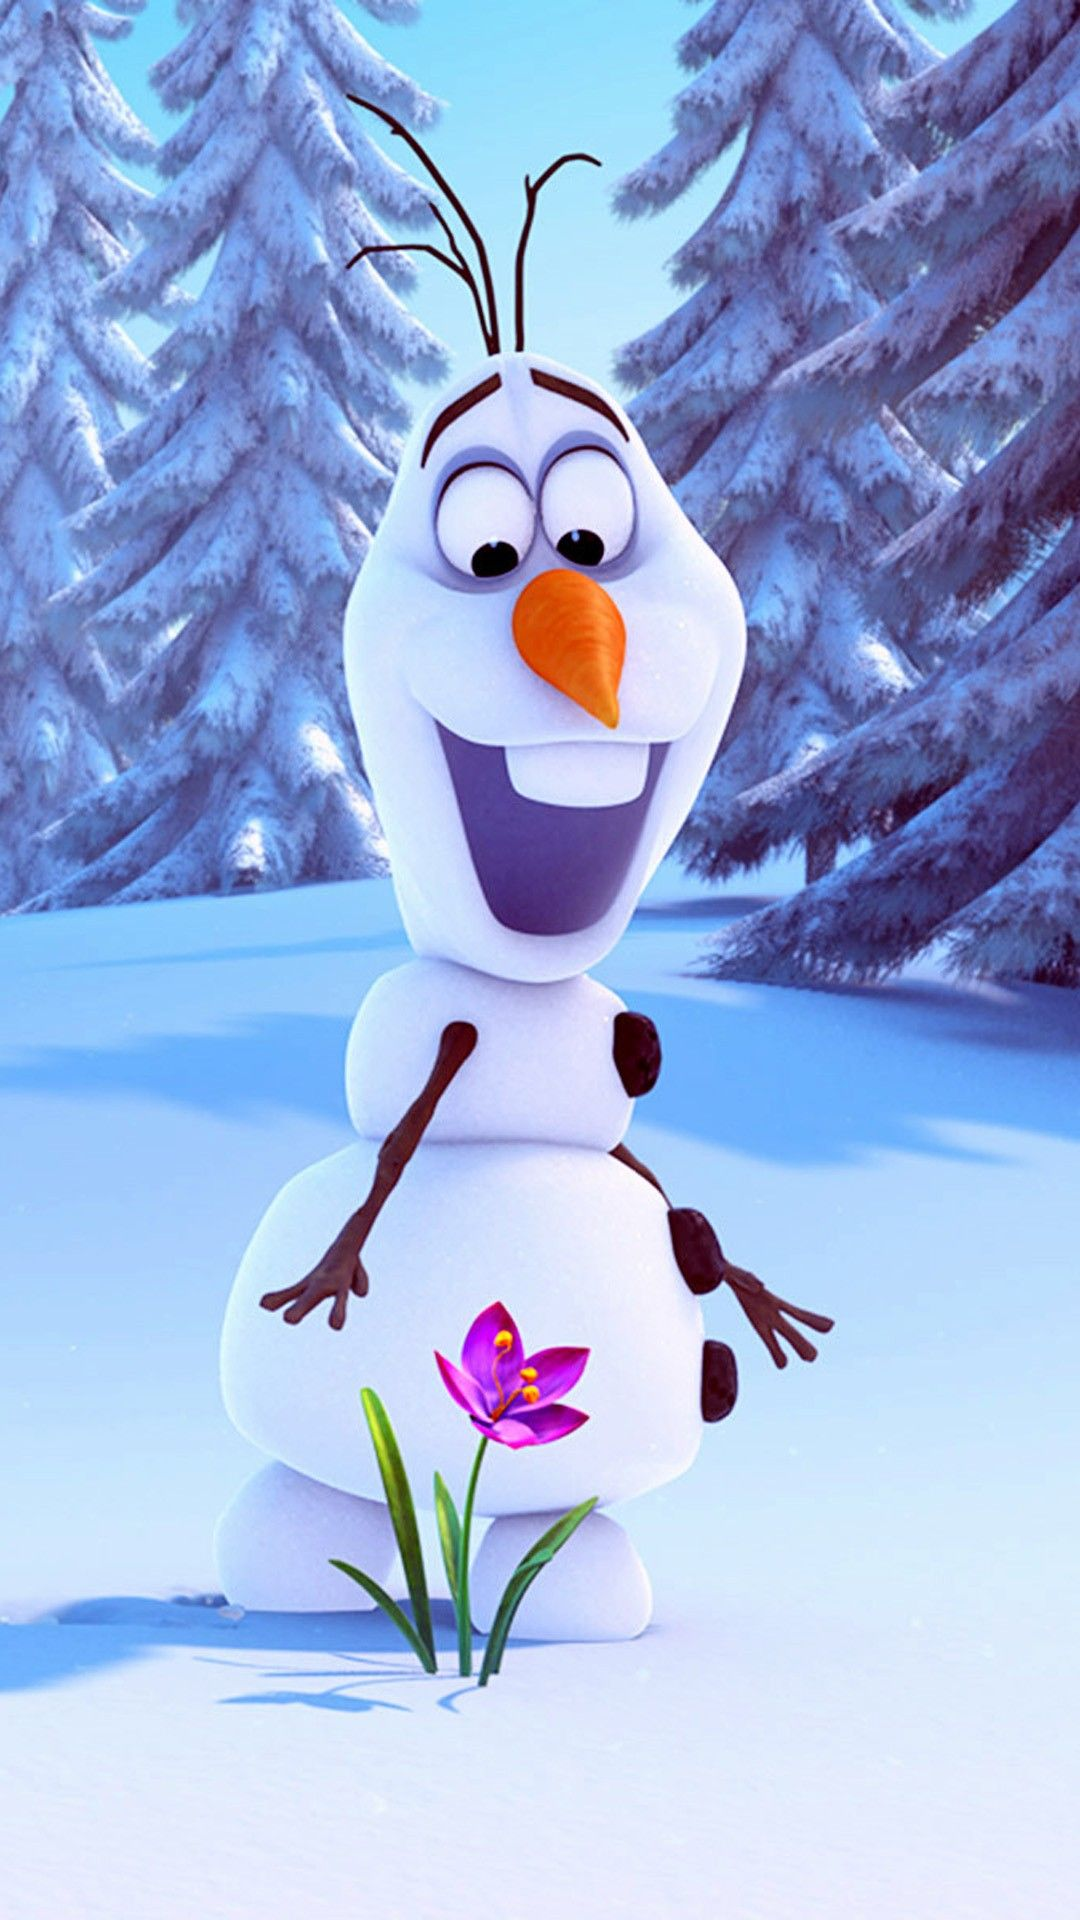 Di disney frozen wall murals - Get 20 Frozen Wallpaper Ideas On Pinterest Without Signing Up Disney Frozen Art Disney Frozen And Frozen Art